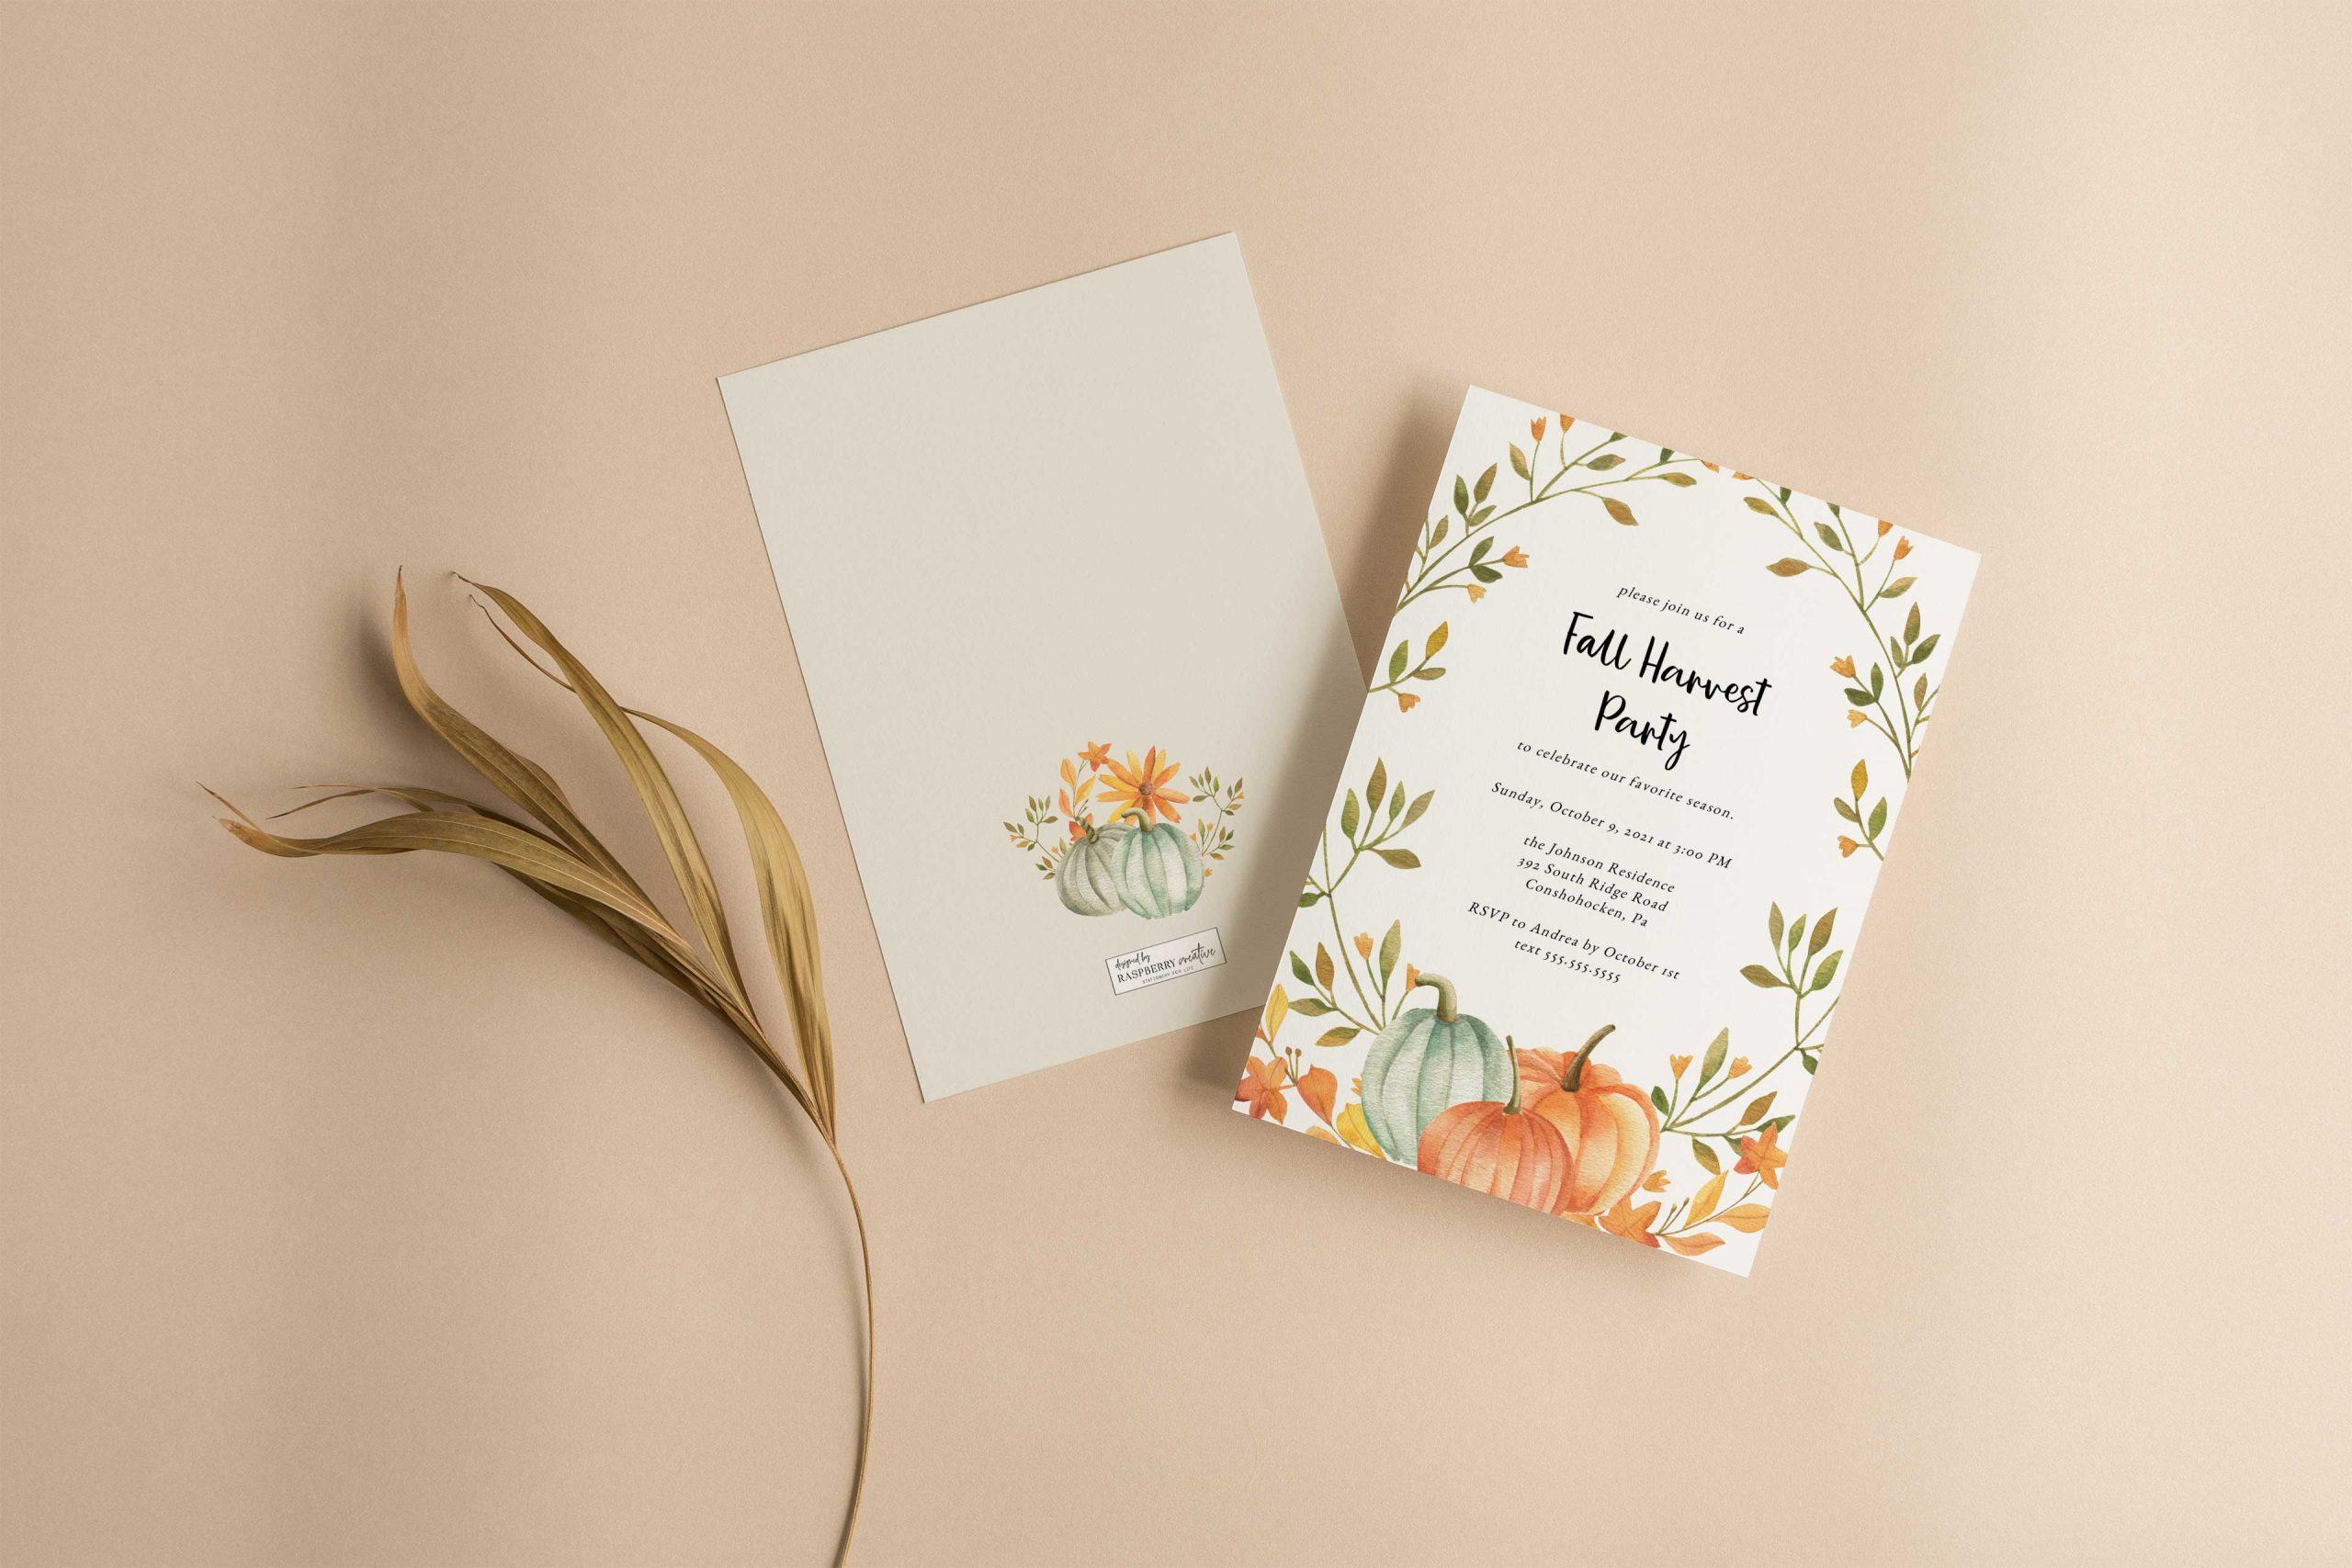 flora-bear-fall-harvest-greenery-party-invitation-1